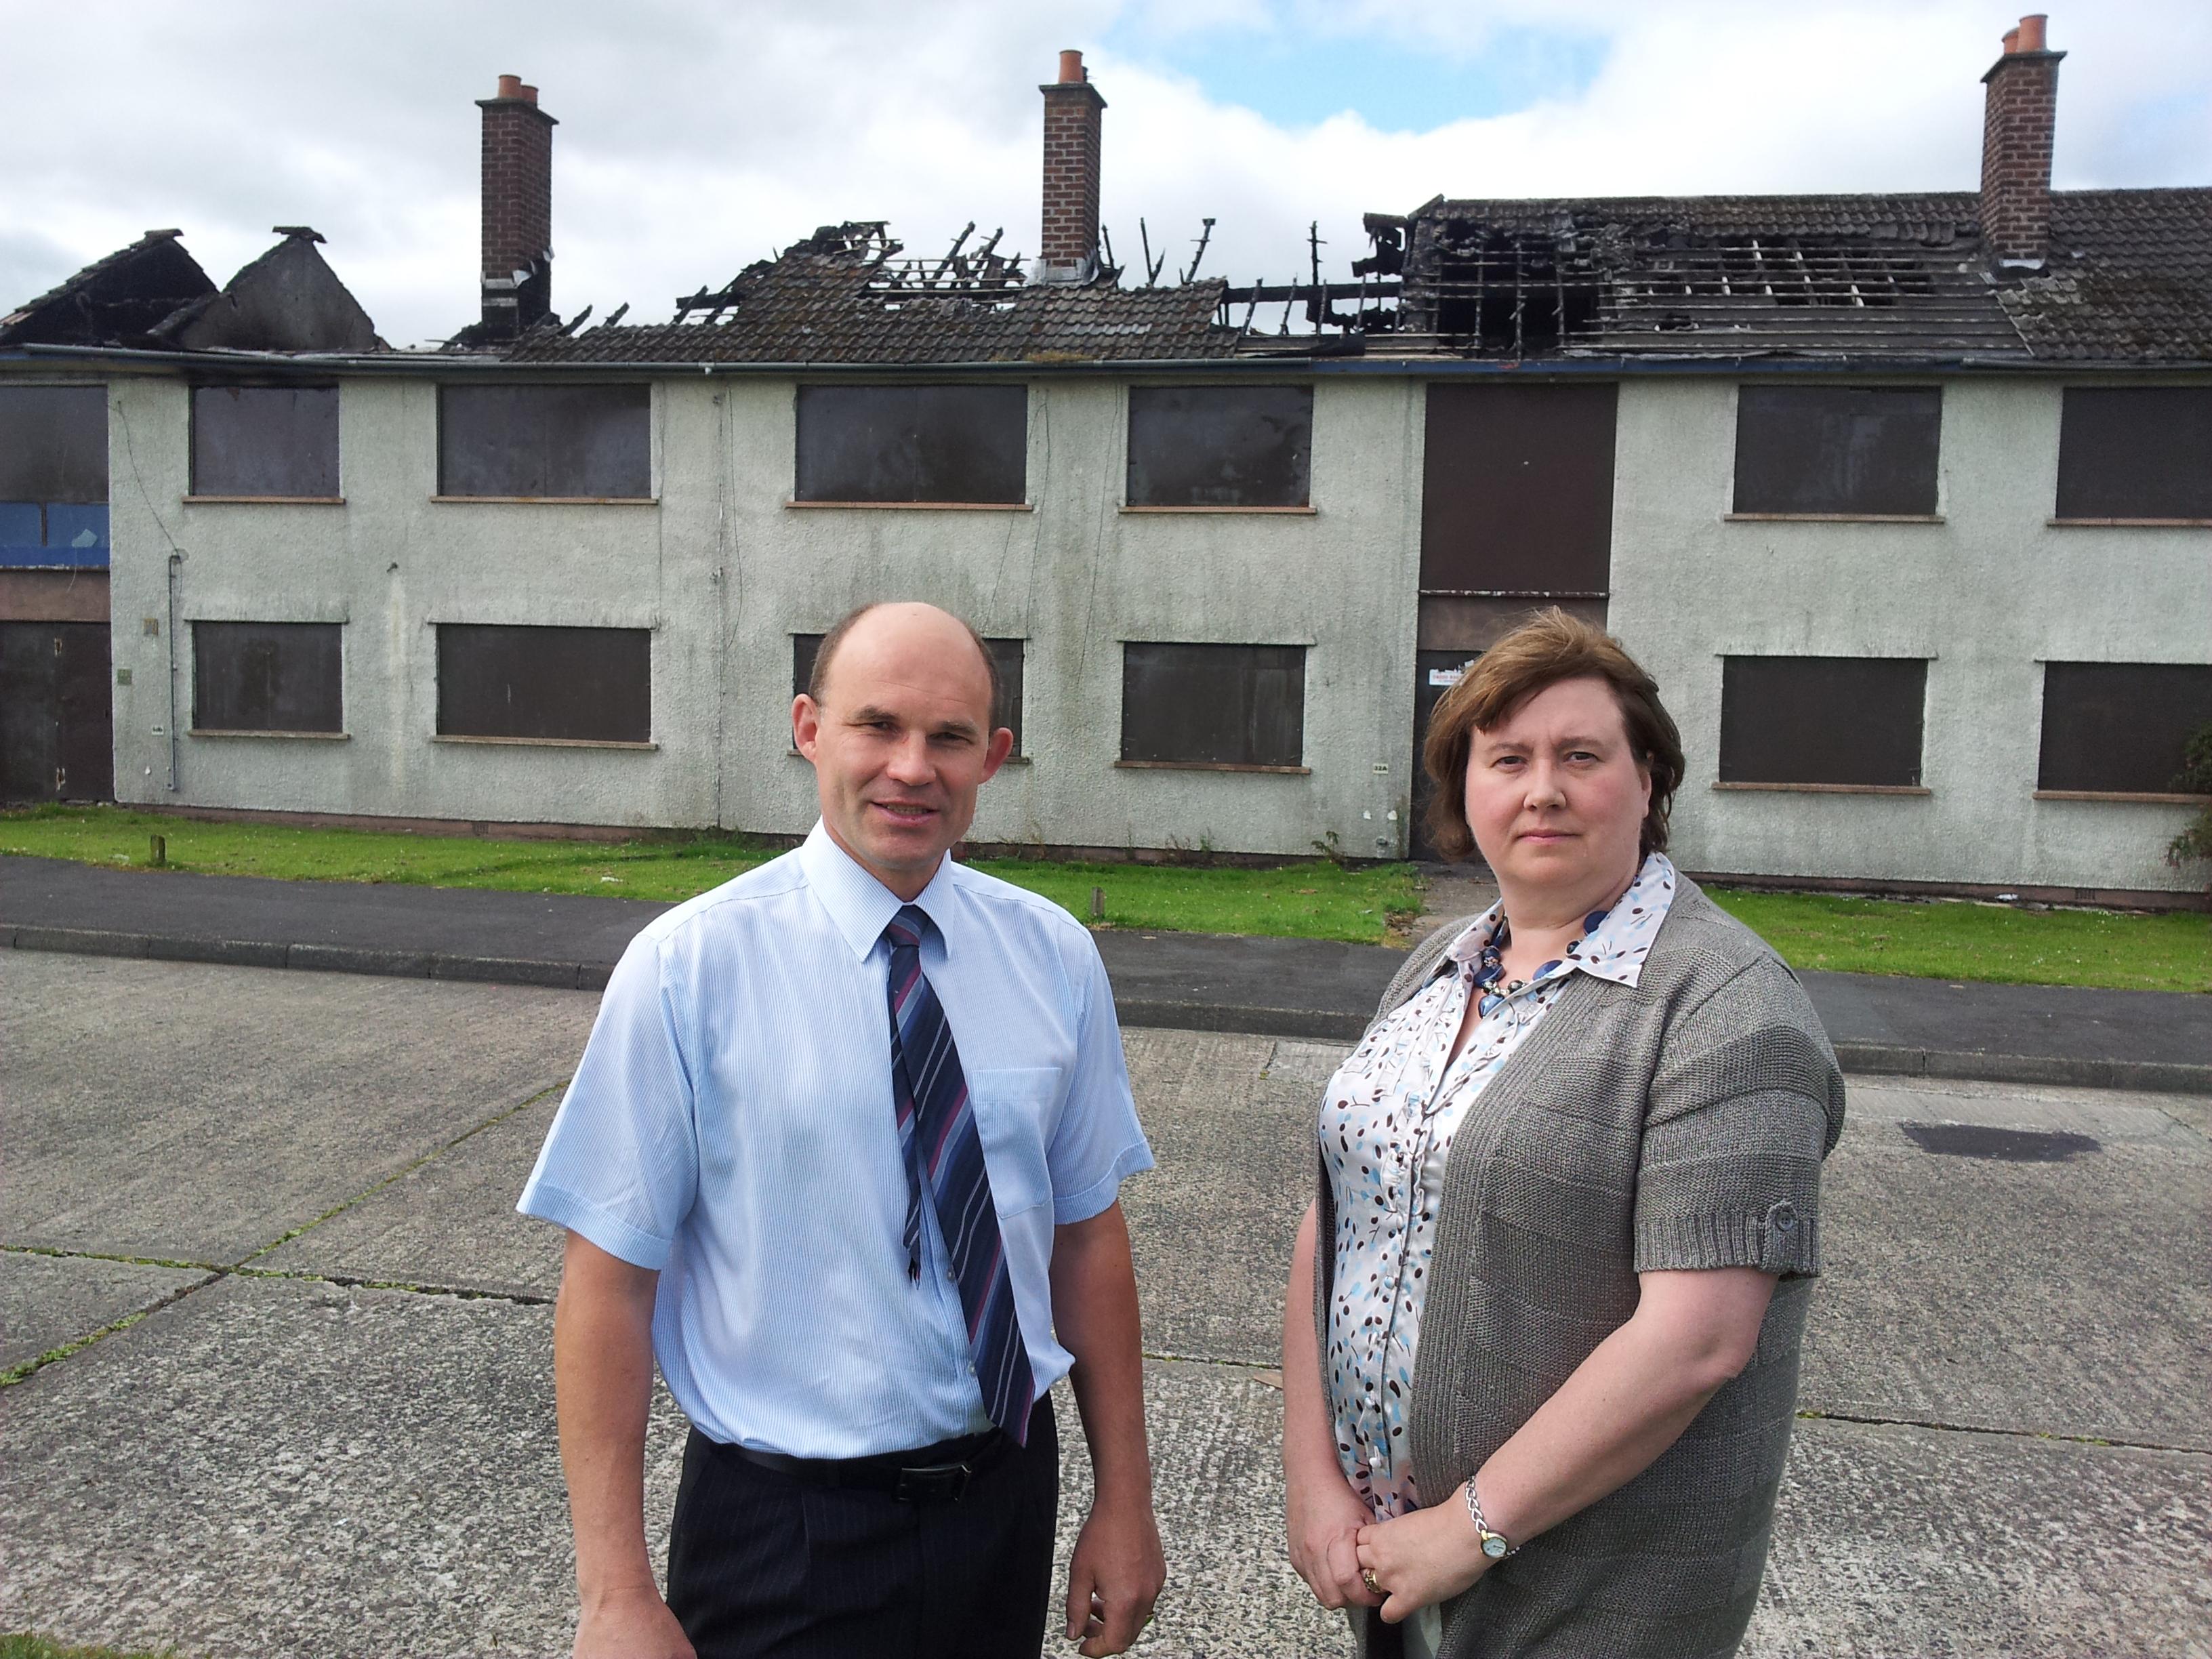 Continuing housing blight at Craigyhill